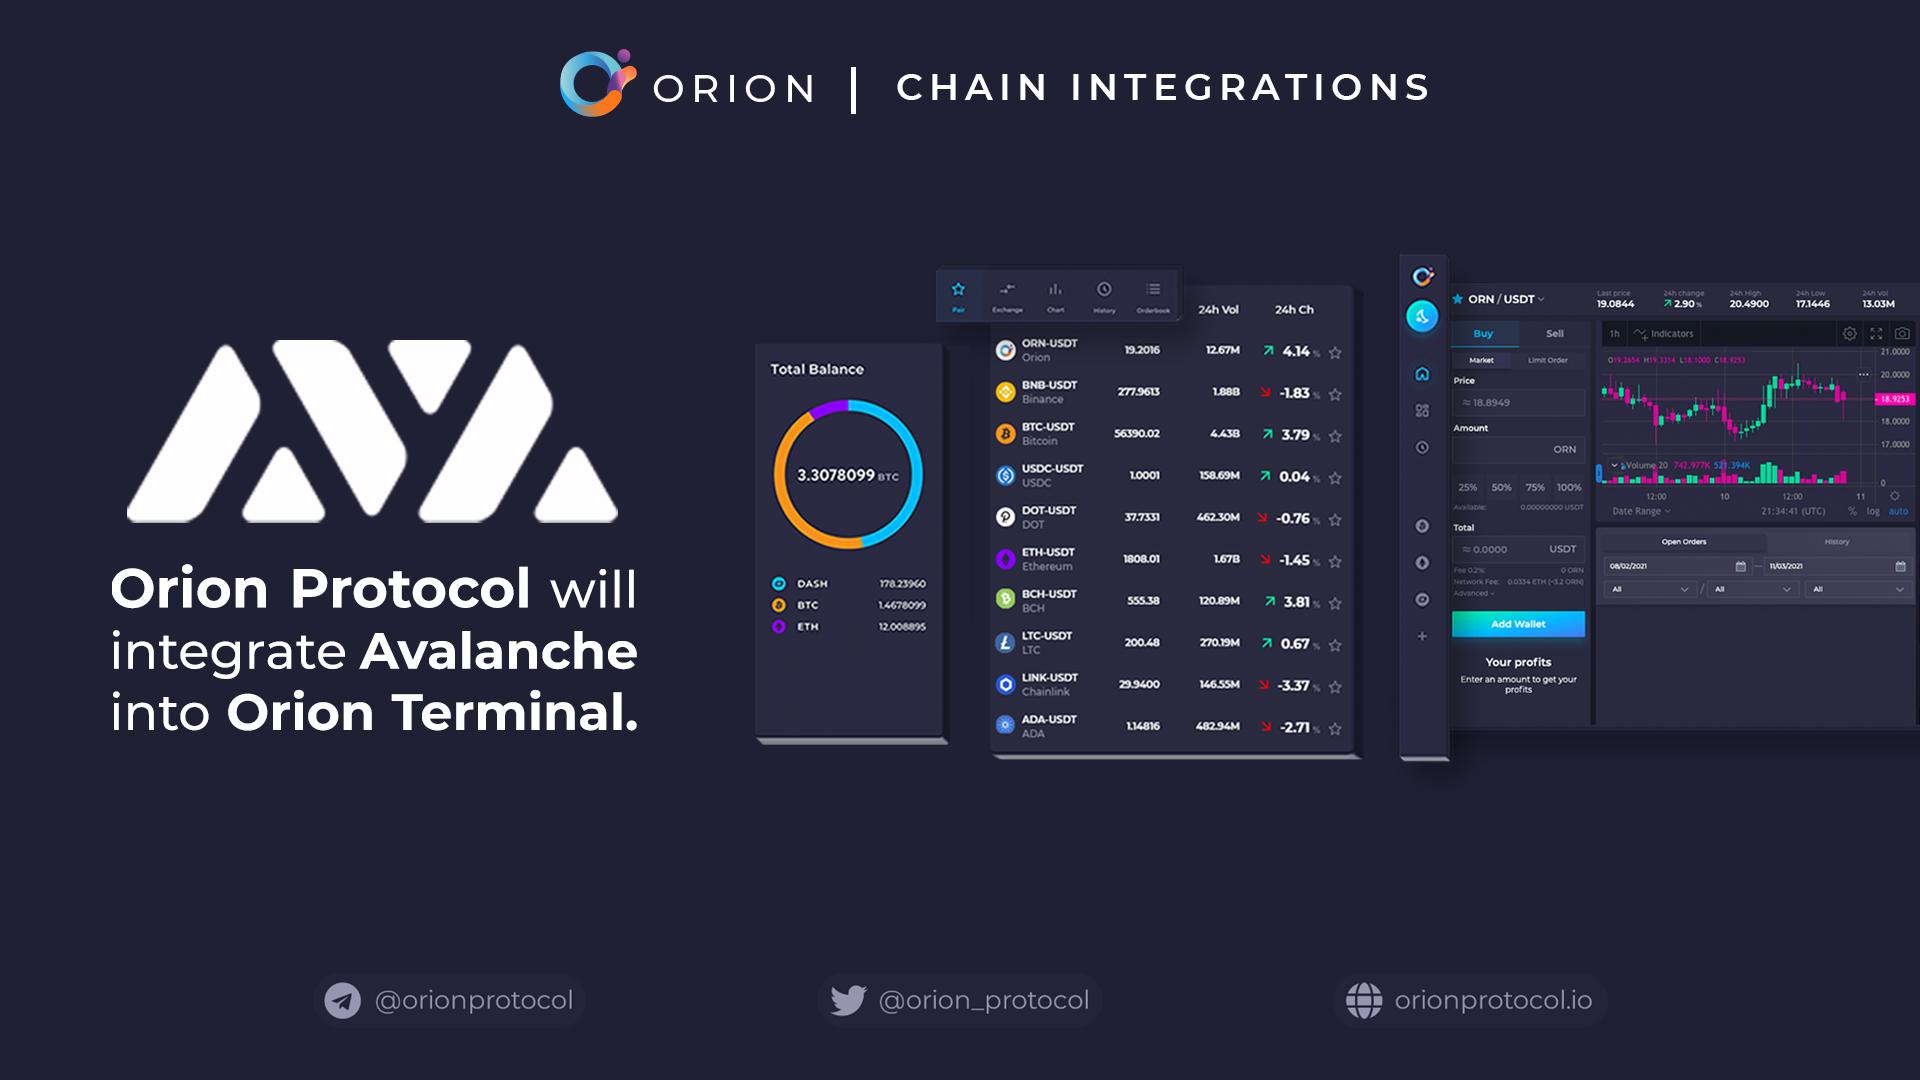 Orion Protocol to Integrate Avalanche Chain